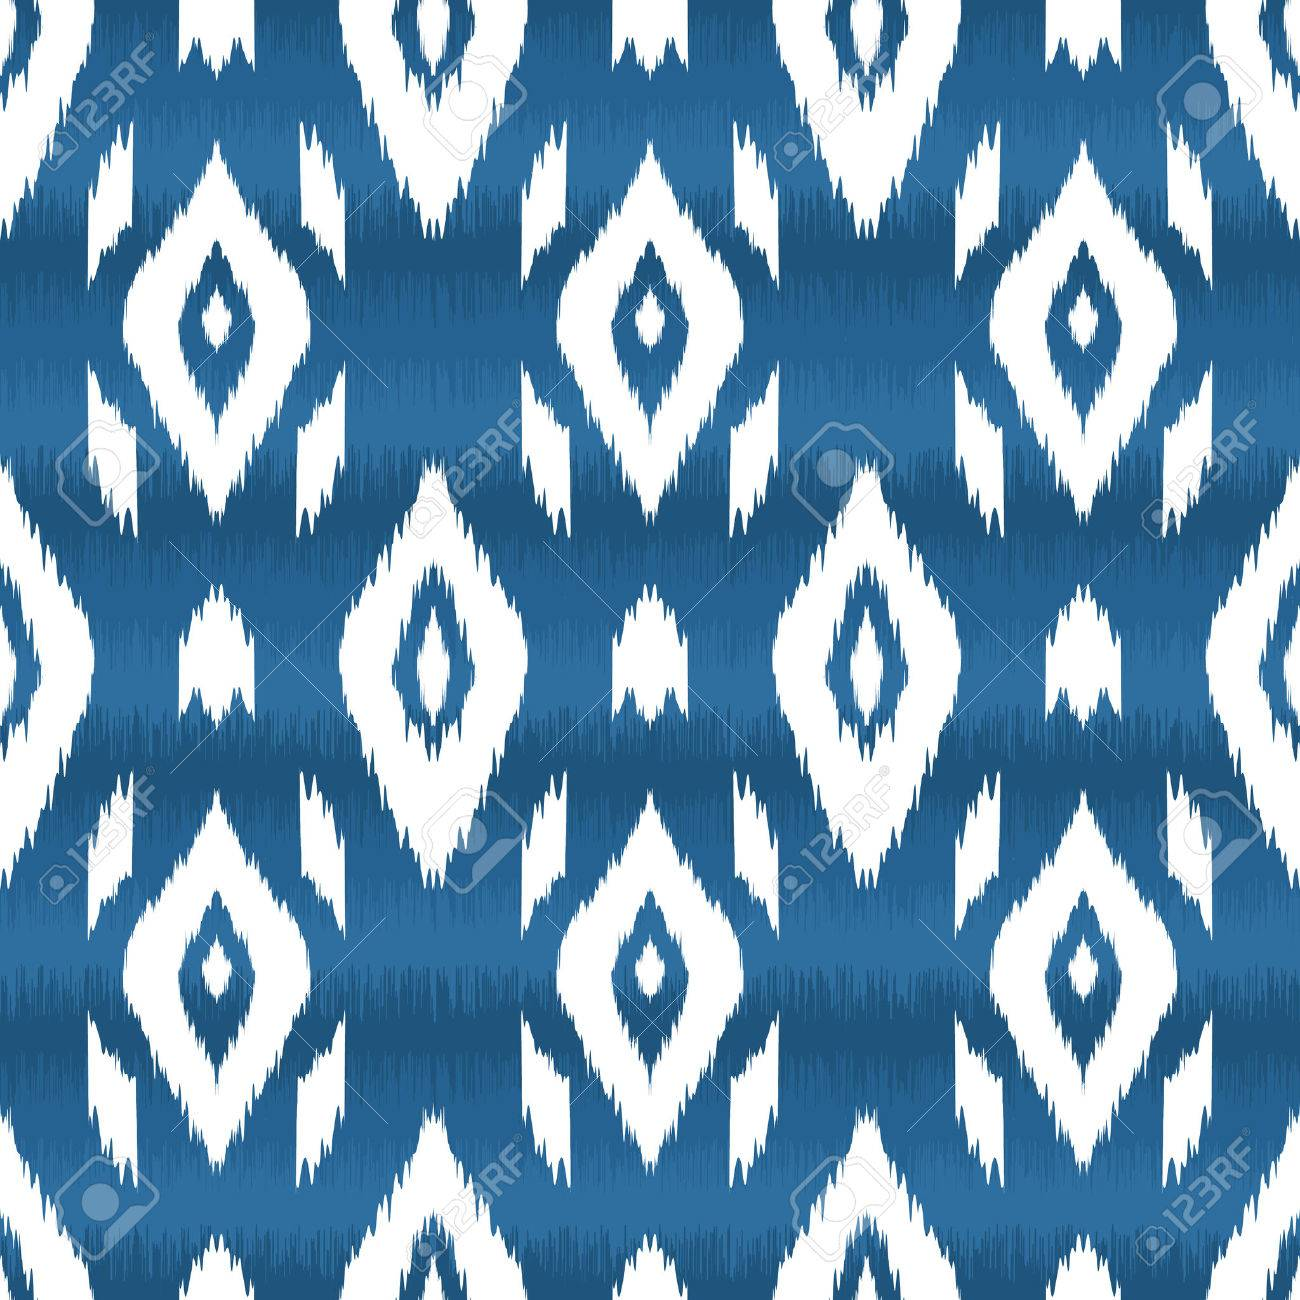 Navajo Wallpaper Home Design on pendleton design wallpaper, sioux design wallpaper, crystal design wallpaper, navajo women's clothing, portuguese design wallpaper, anchor design wallpaper, hopi design wallpaper, hindi design wallpaper, latin design wallpaper, new mexico design wallpaper, navajo indian designs, mayan design wallpaper, navajo border designs, scout design wallpaper, navajo rug designs, native american design wallpaper, samoan design wallpaper, aztec design wallpaper, irish design wallpaper, globe design wallpaper,